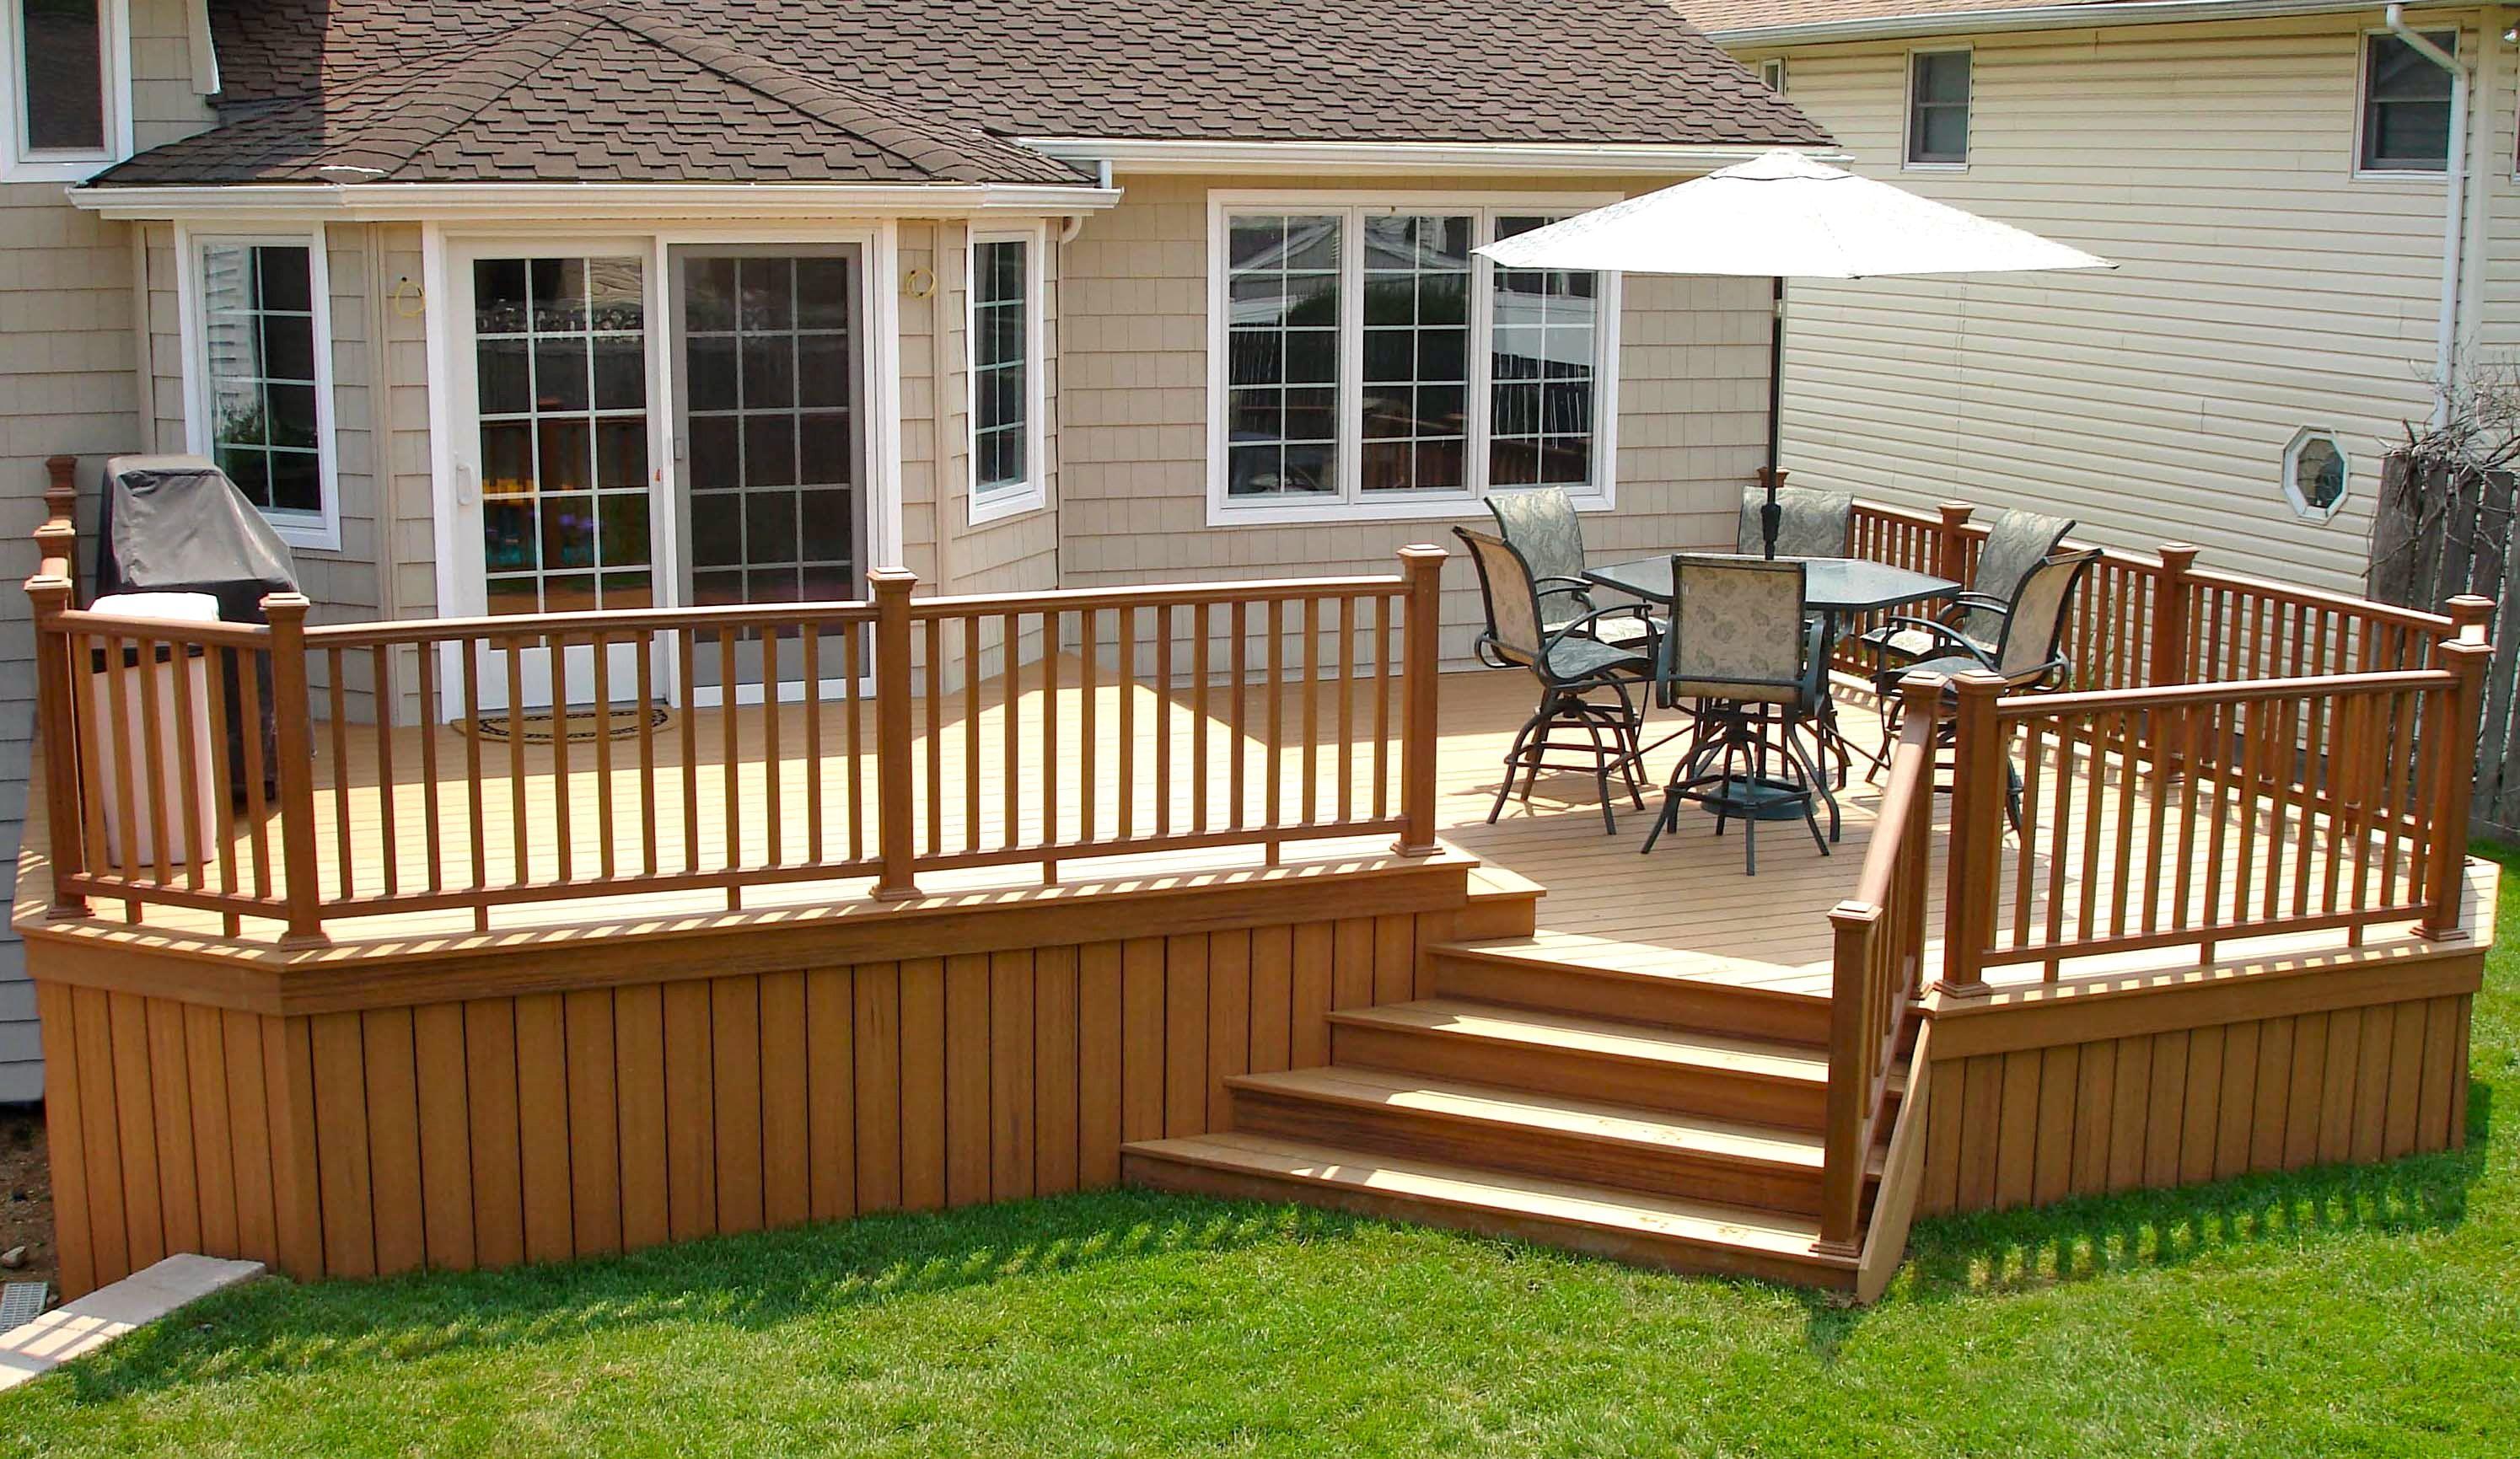 trex bi level deck with trex railings long island decks. Black Bedroom Furniture Sets. Home Design Ideas